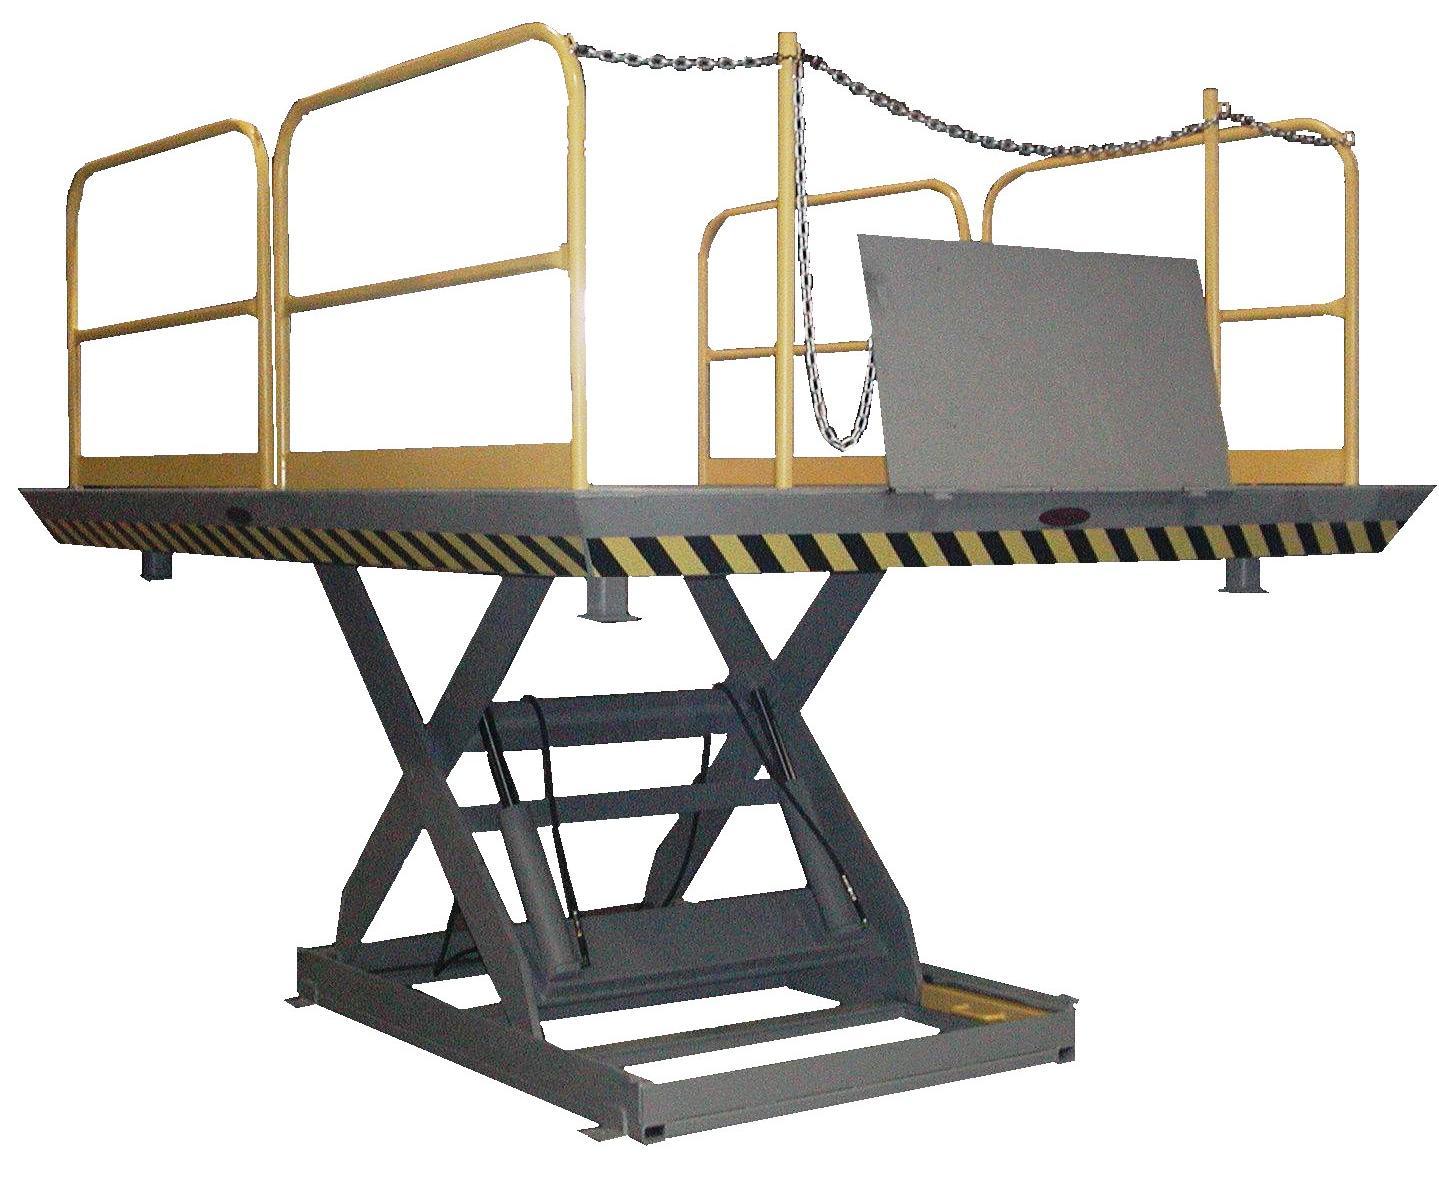 Copperloy's Hydraulic Ramp